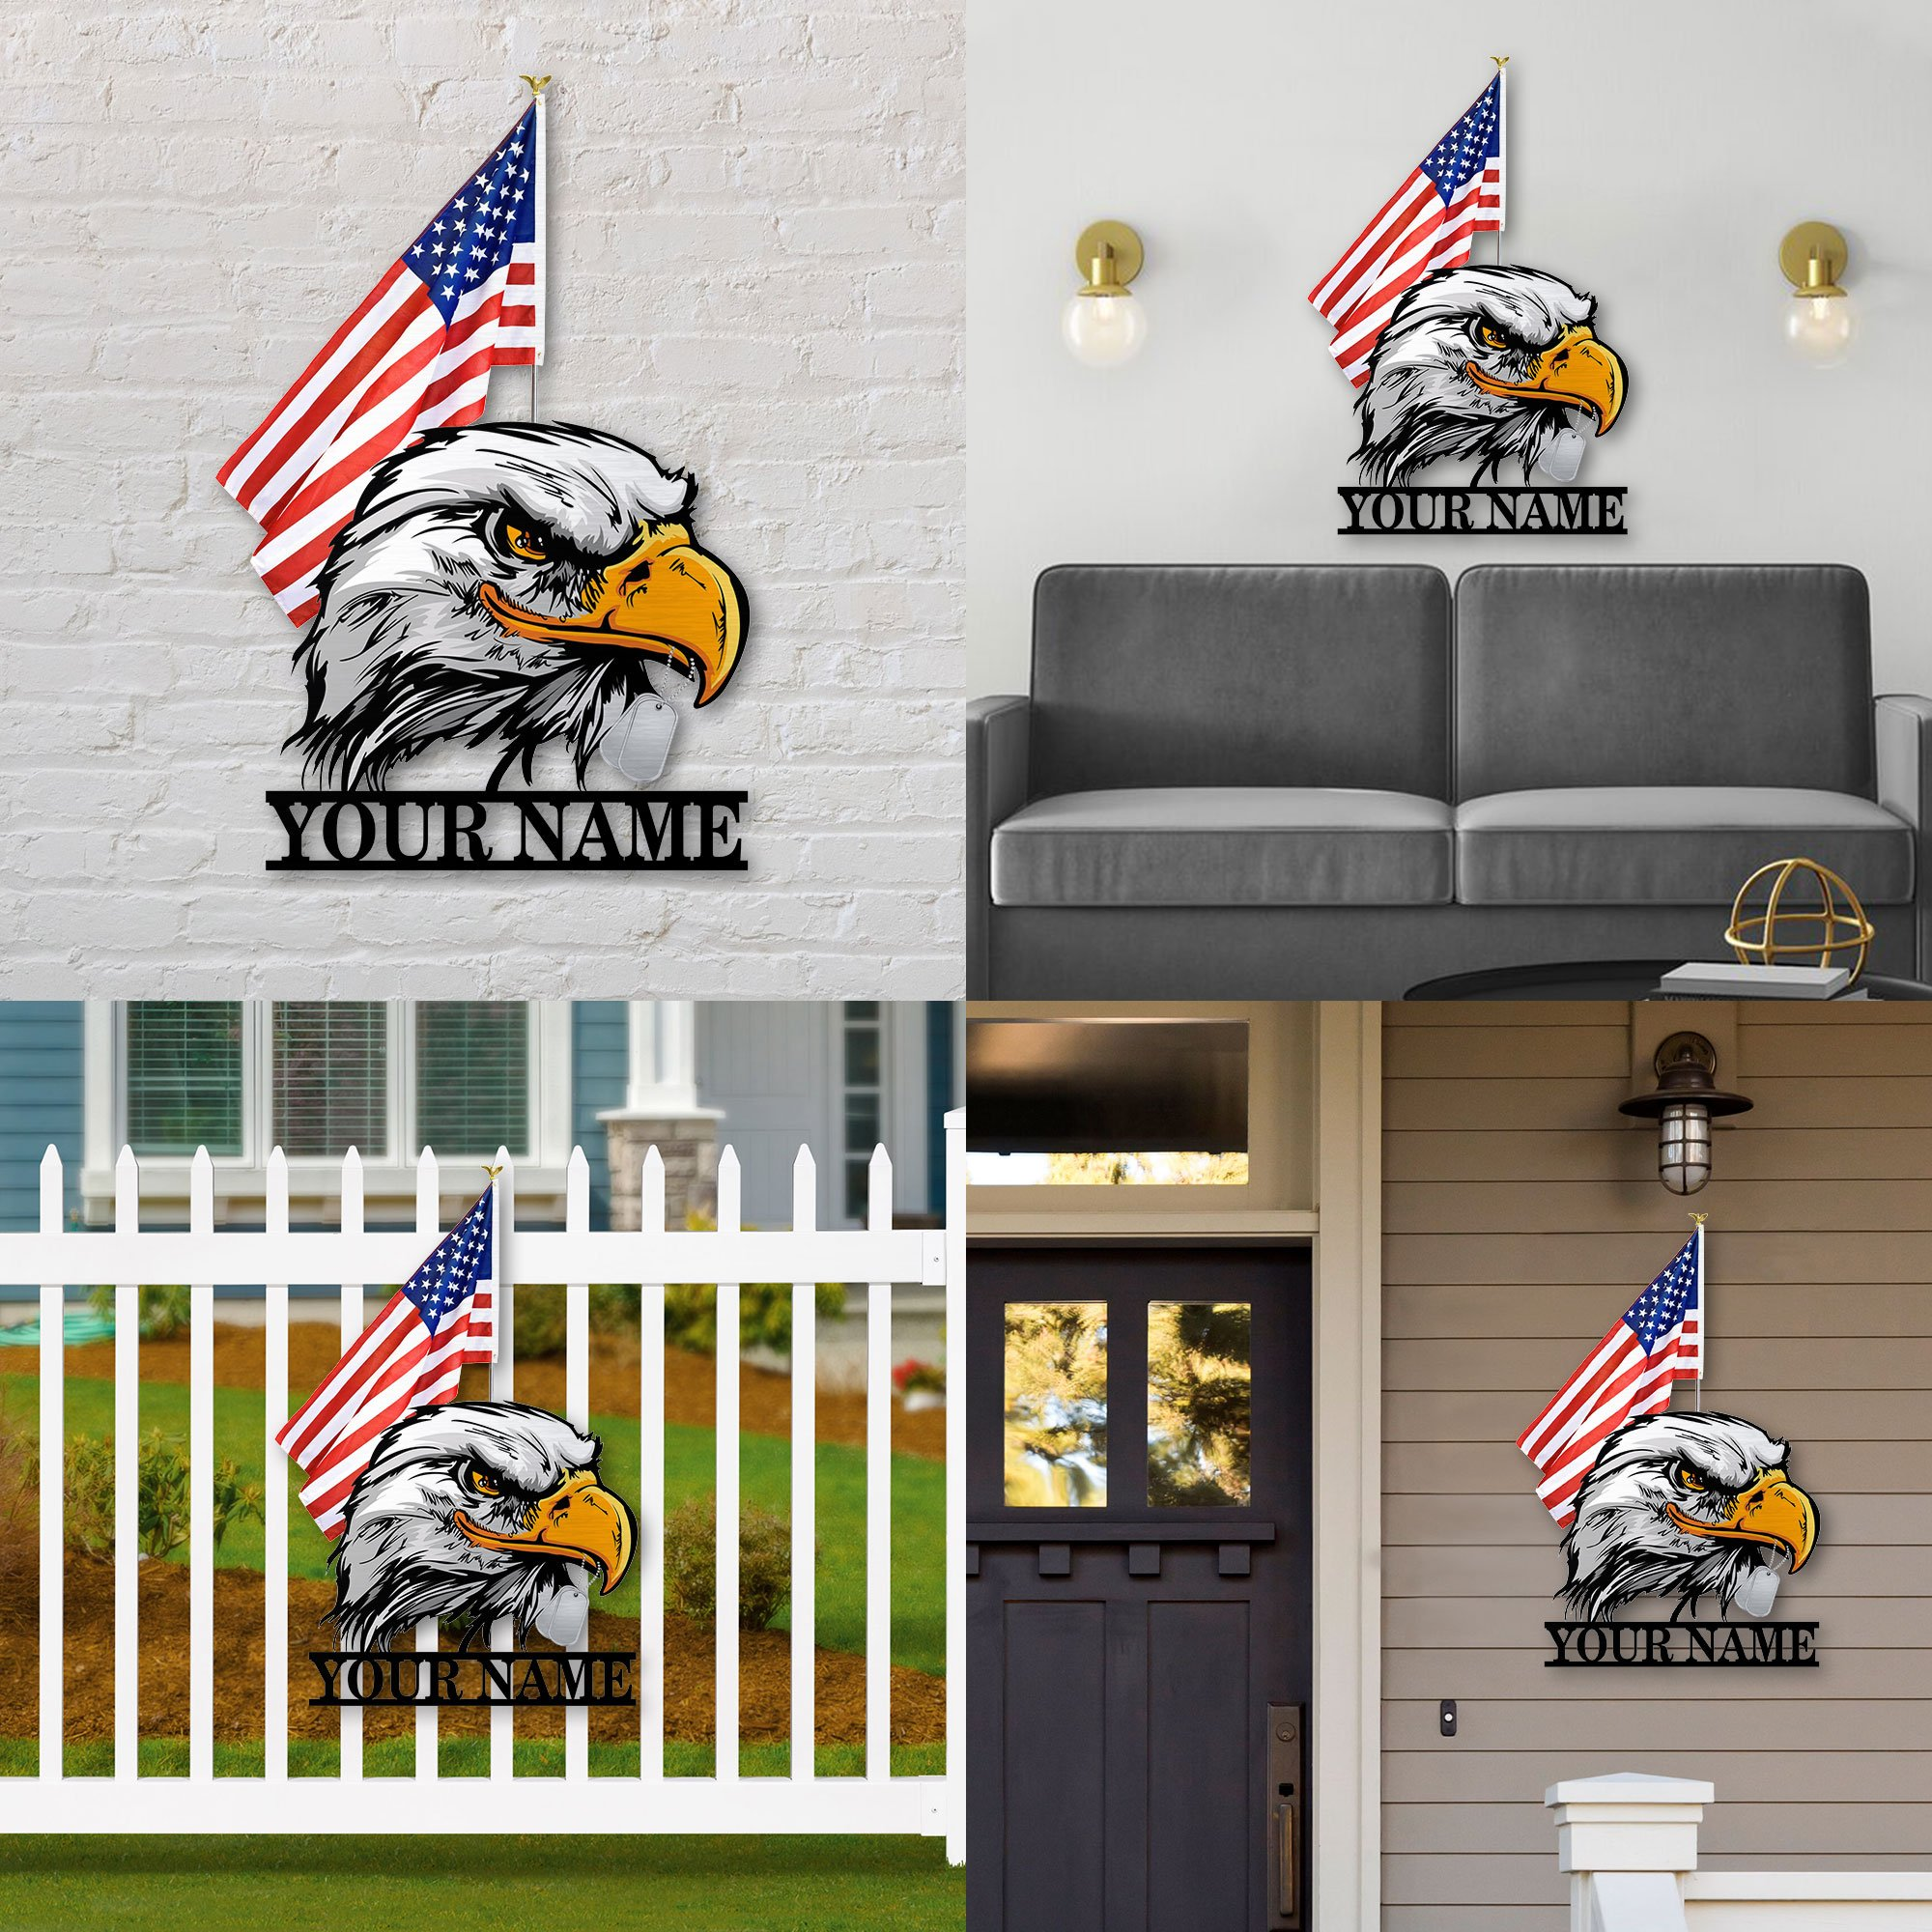 American flag eagle custom personalized metal sign 5